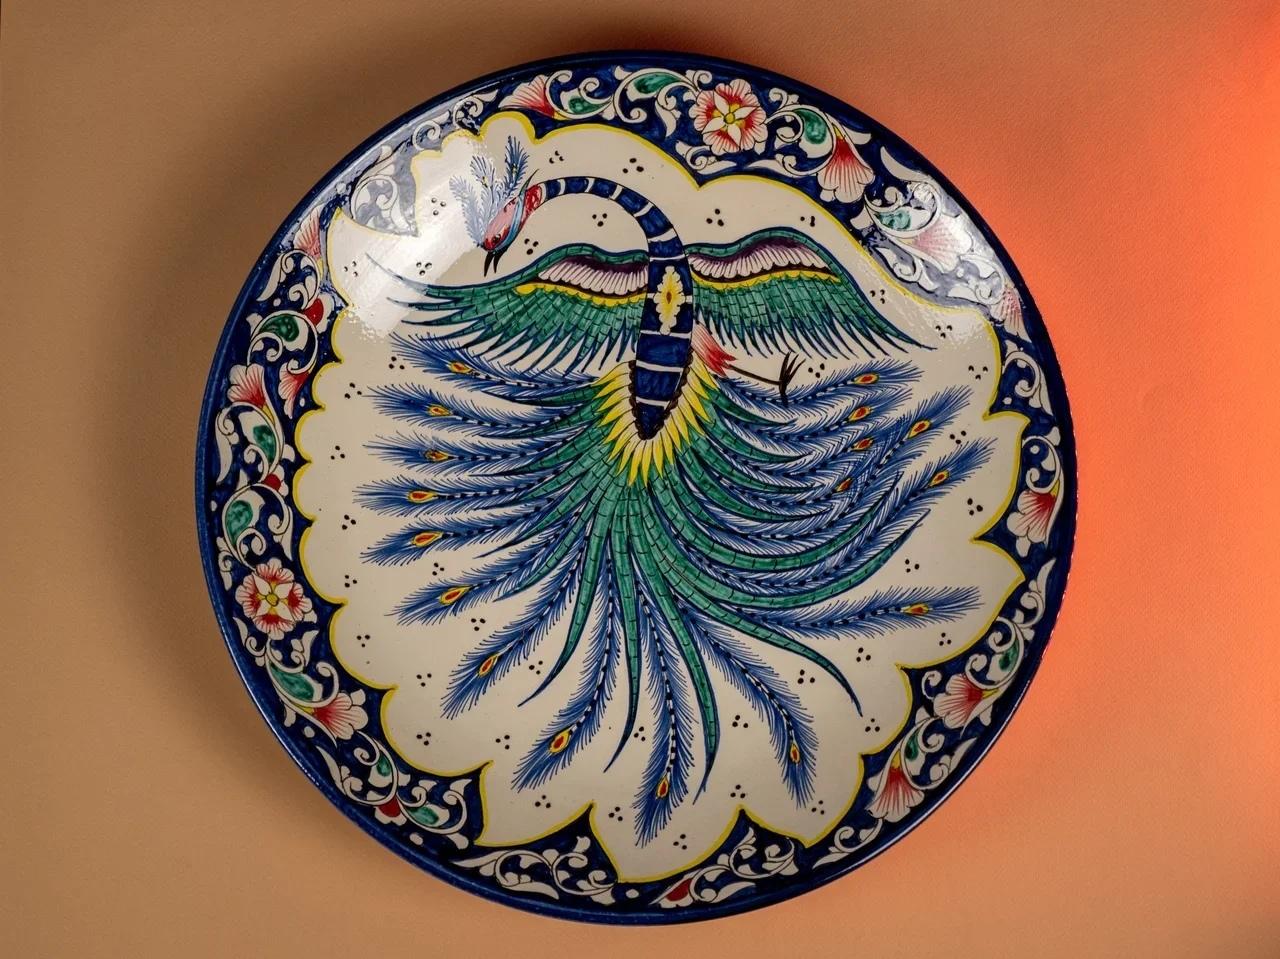 Посуда Ляган ручная роспись 42 см PlZHuF9Ev2M.jpg